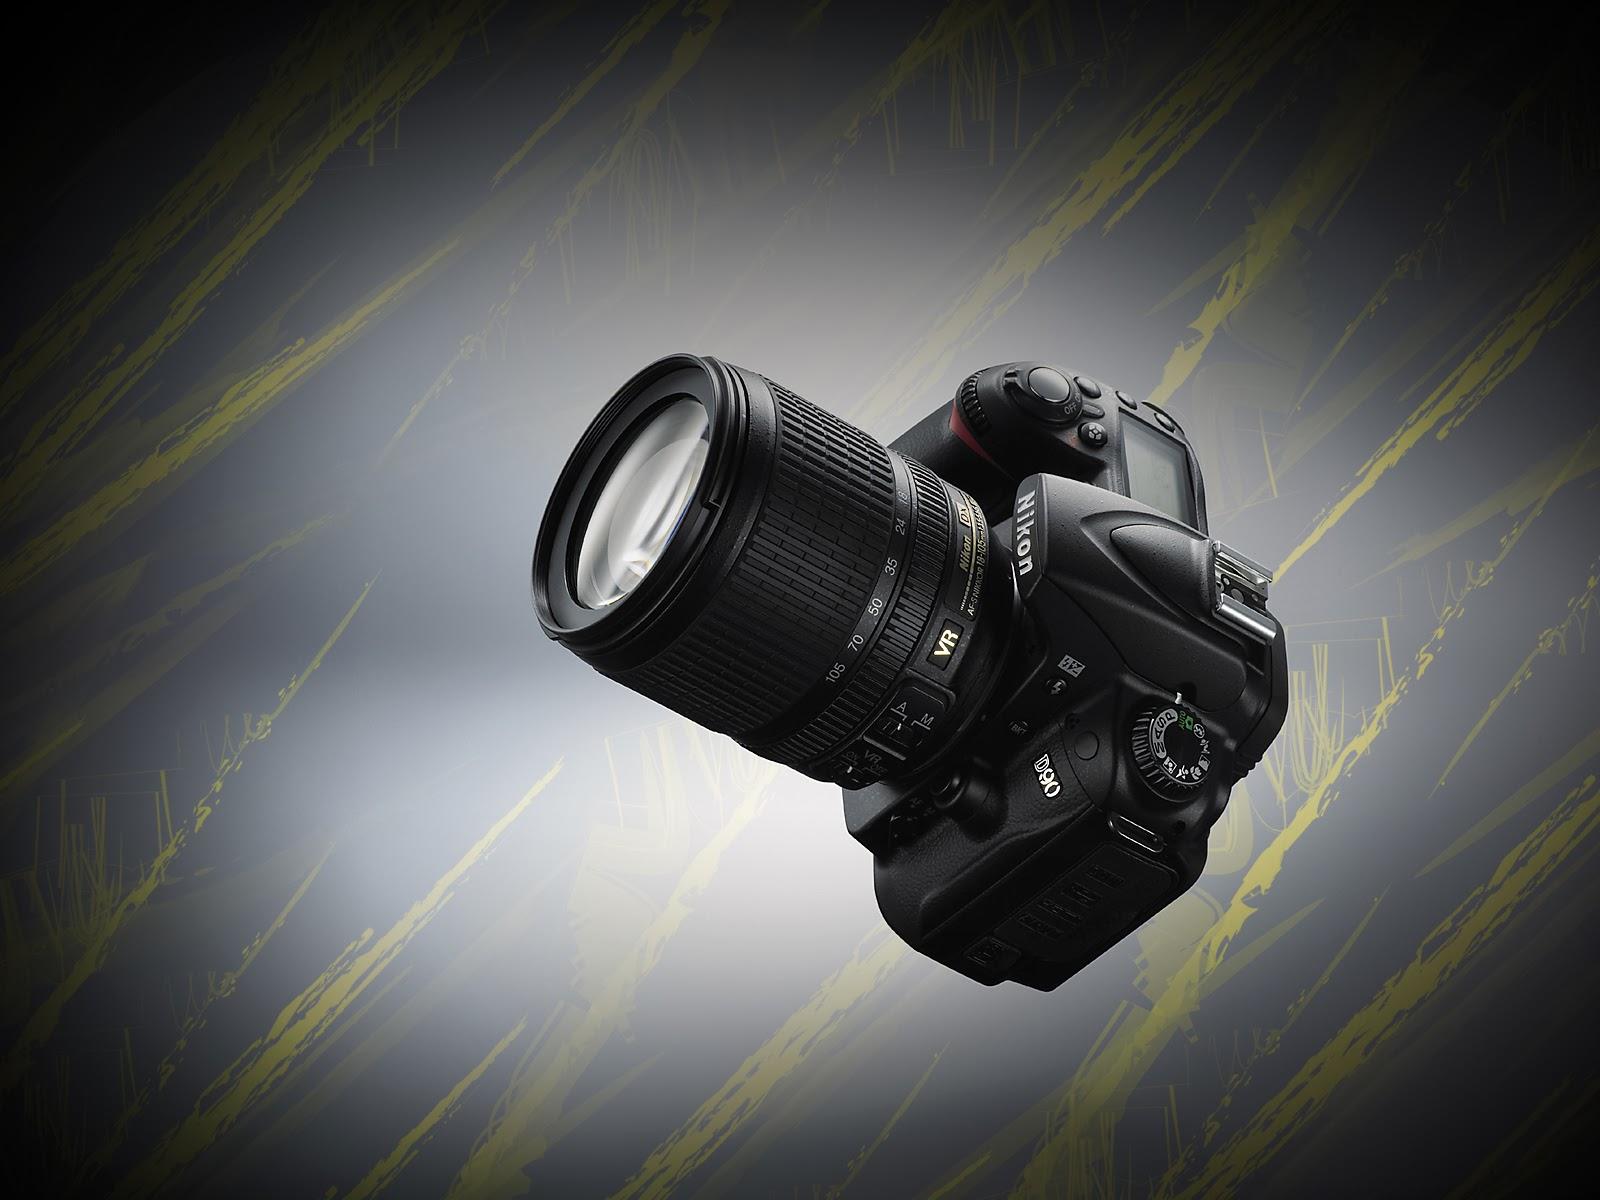 Nikon D90 Camera Wallpapers